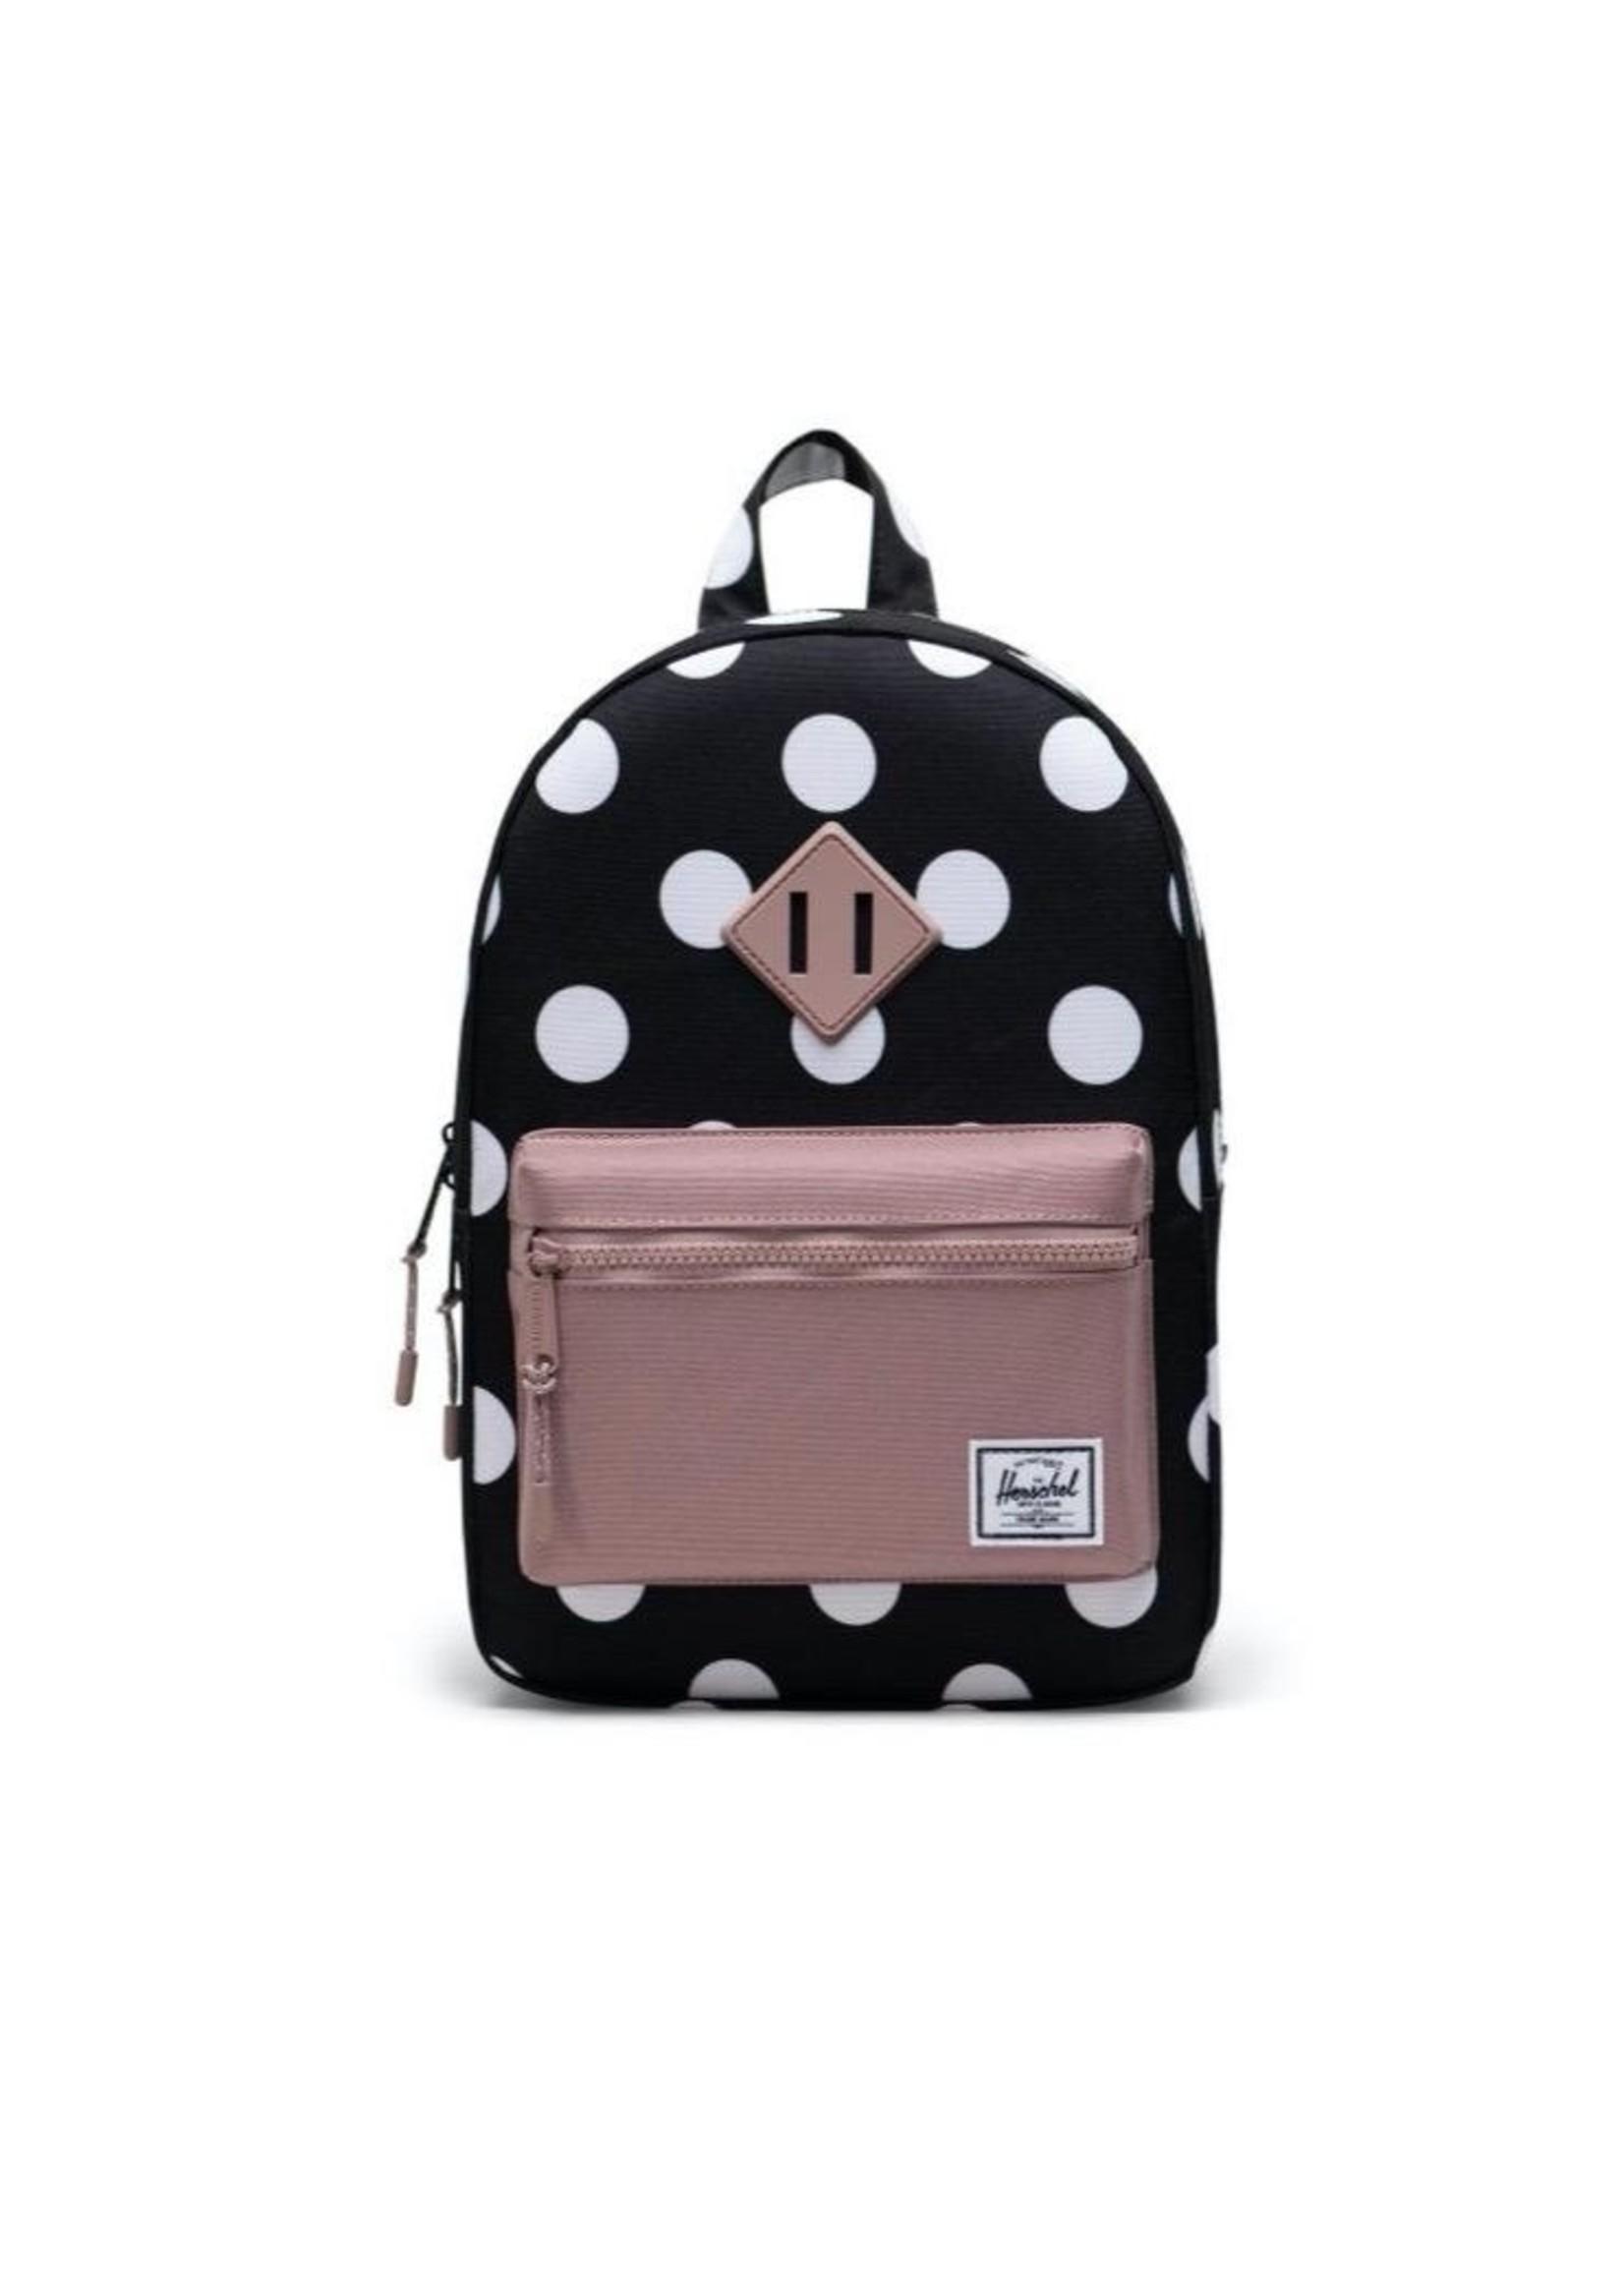 Herschel Supply Co. Heritage Backpack   Youth, Polka Dot Black and White/Ash Rose, 16L